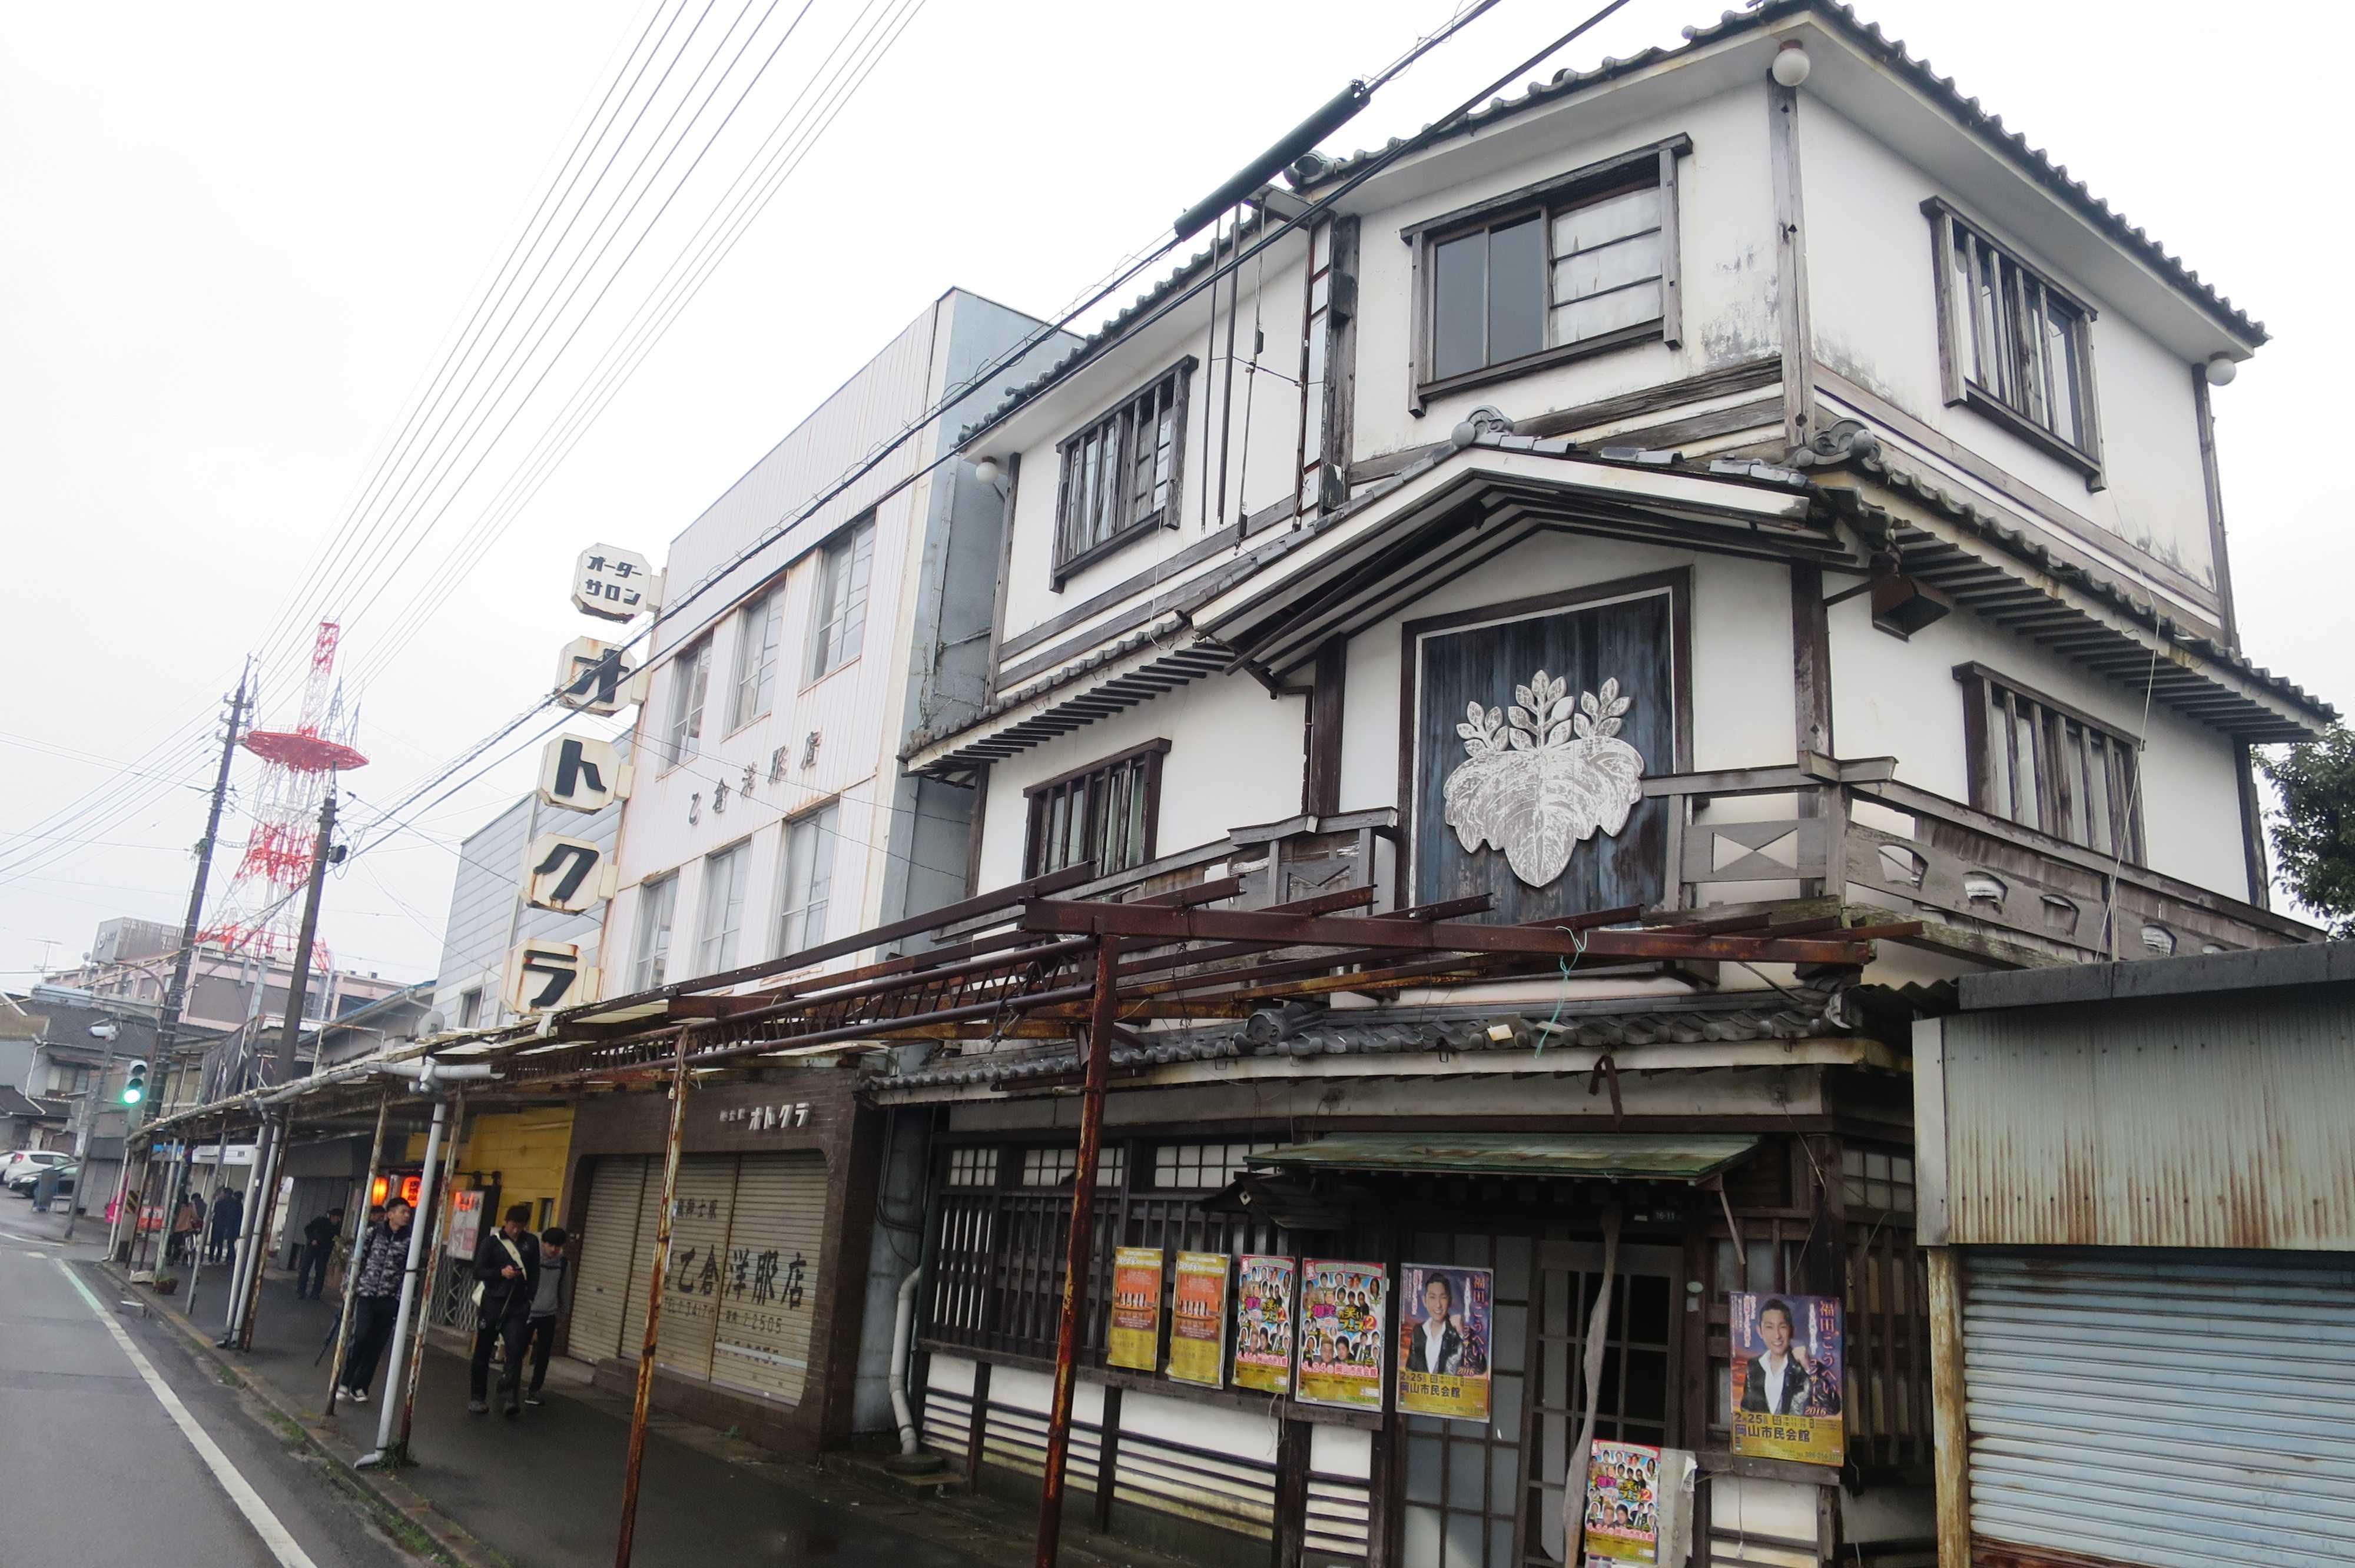 西大寺・観音院通り 古い建物